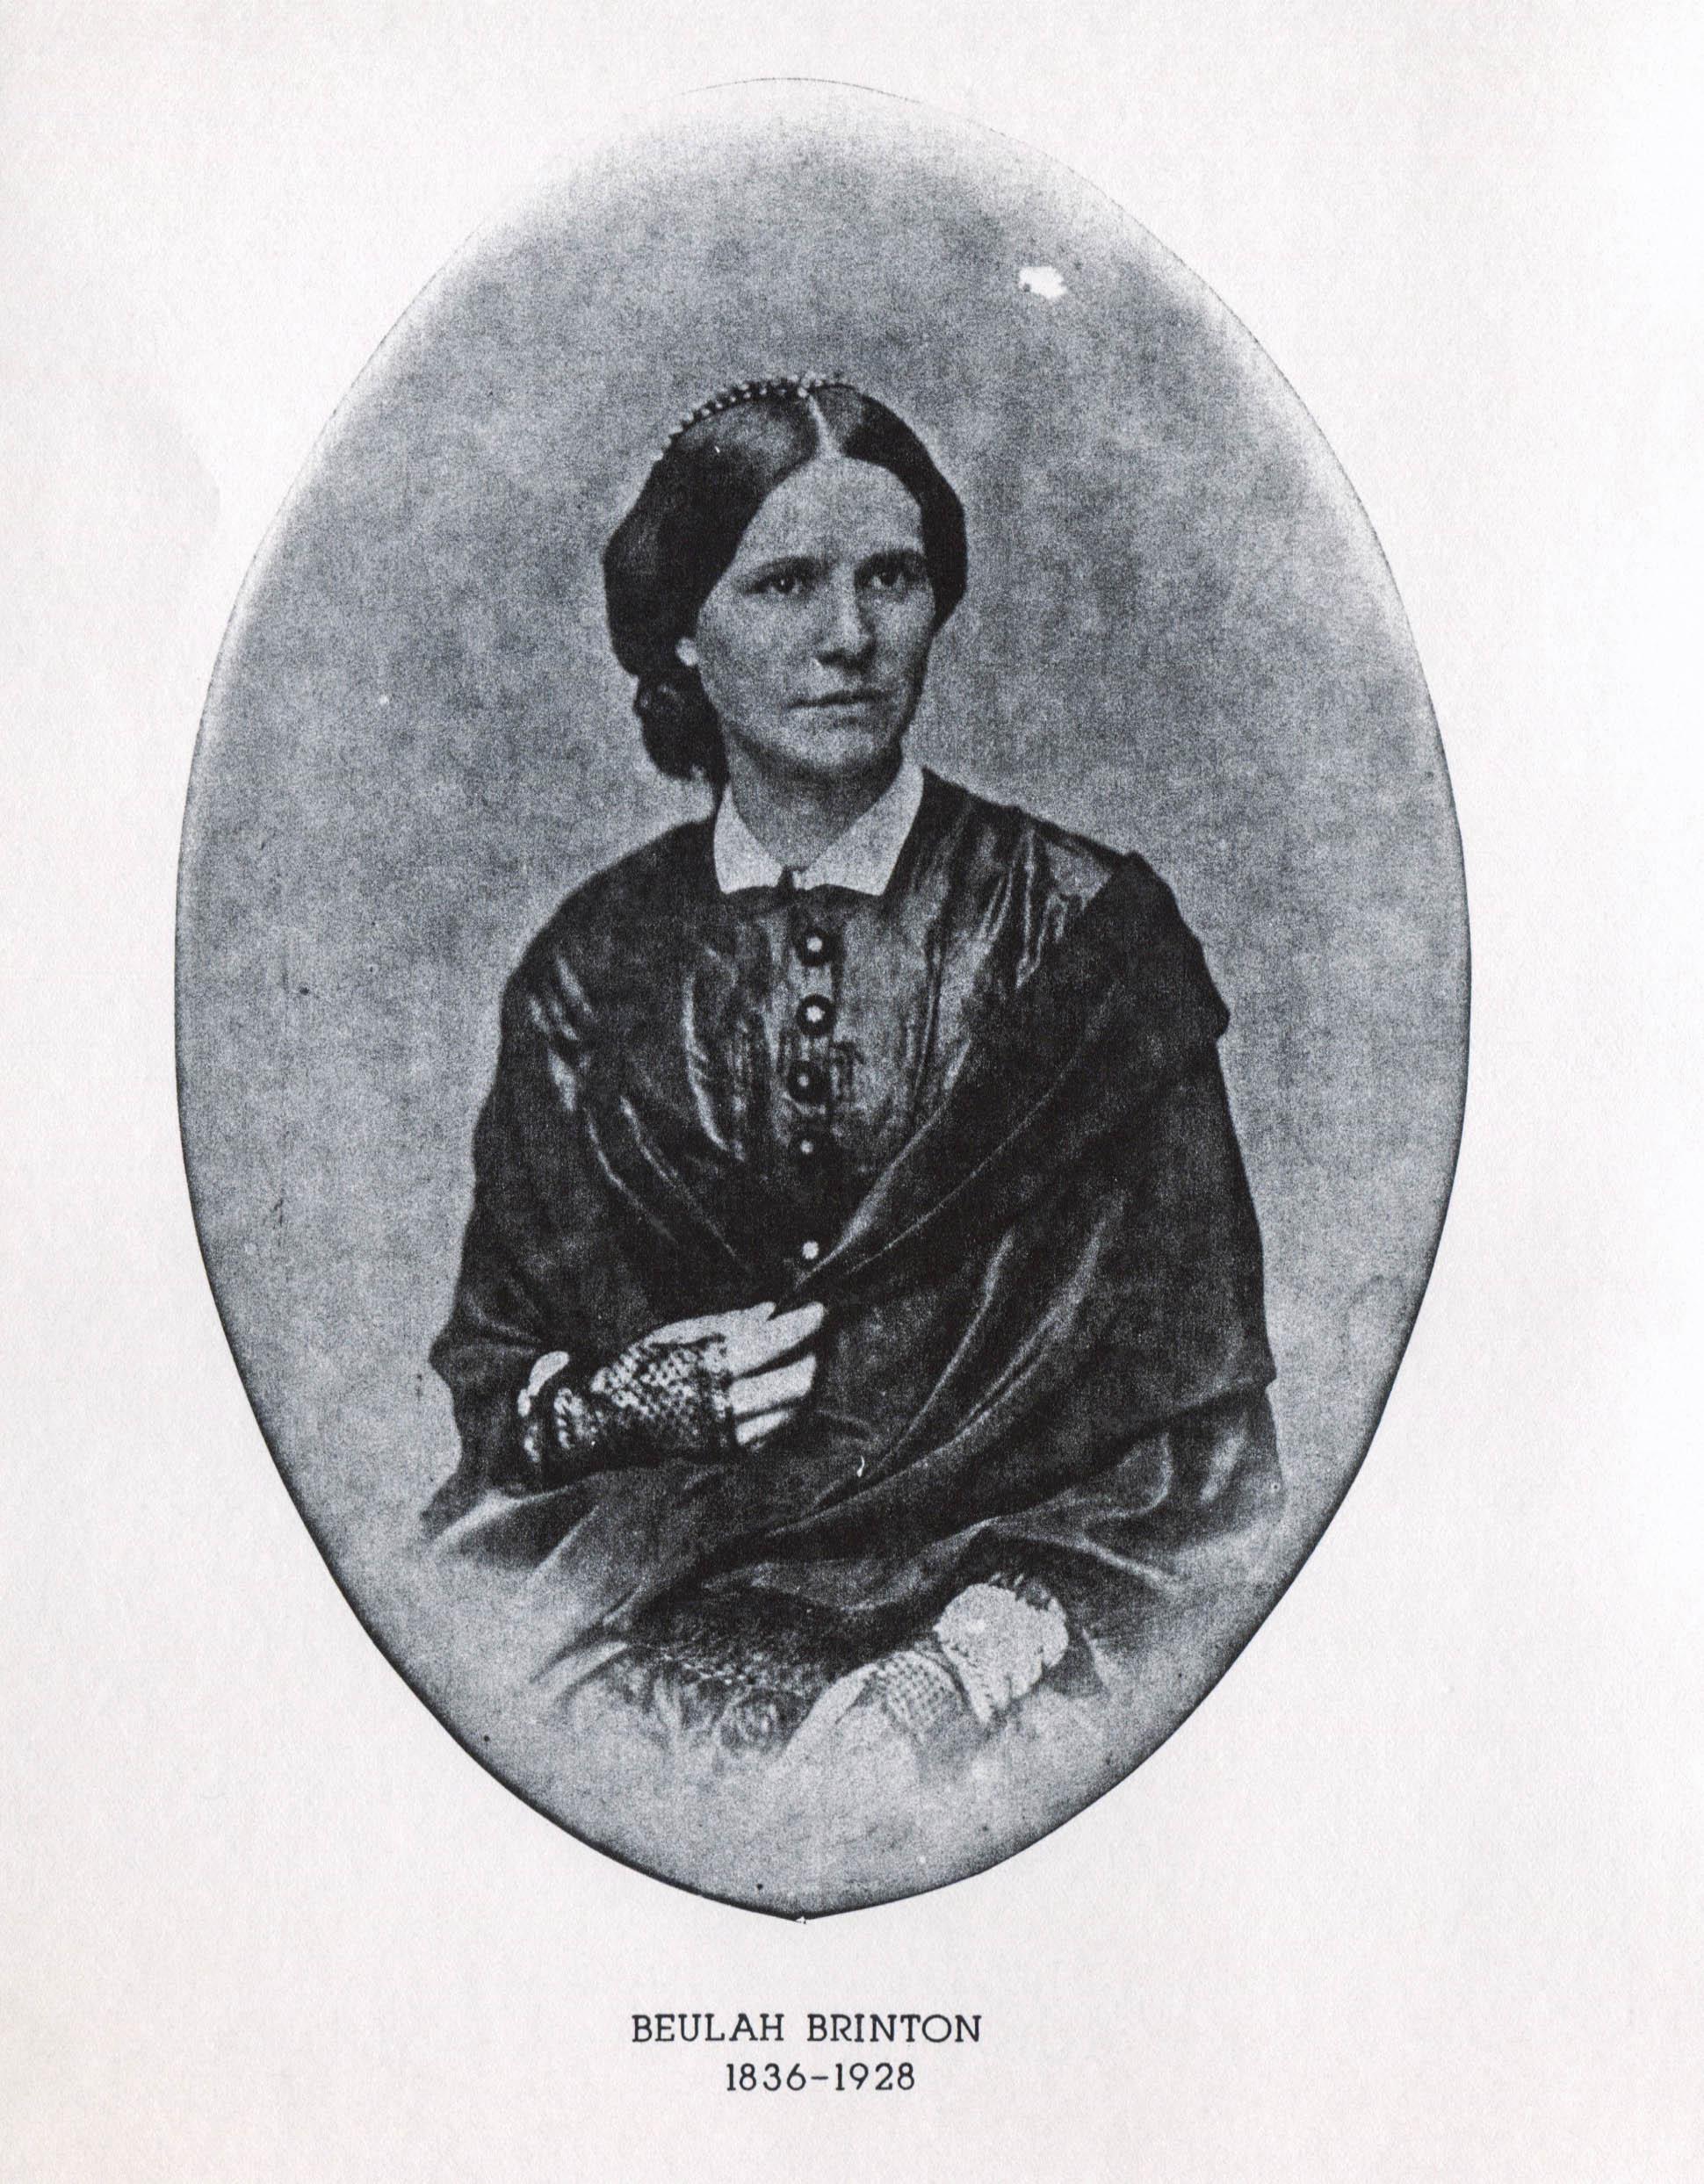 Beulah Brinton